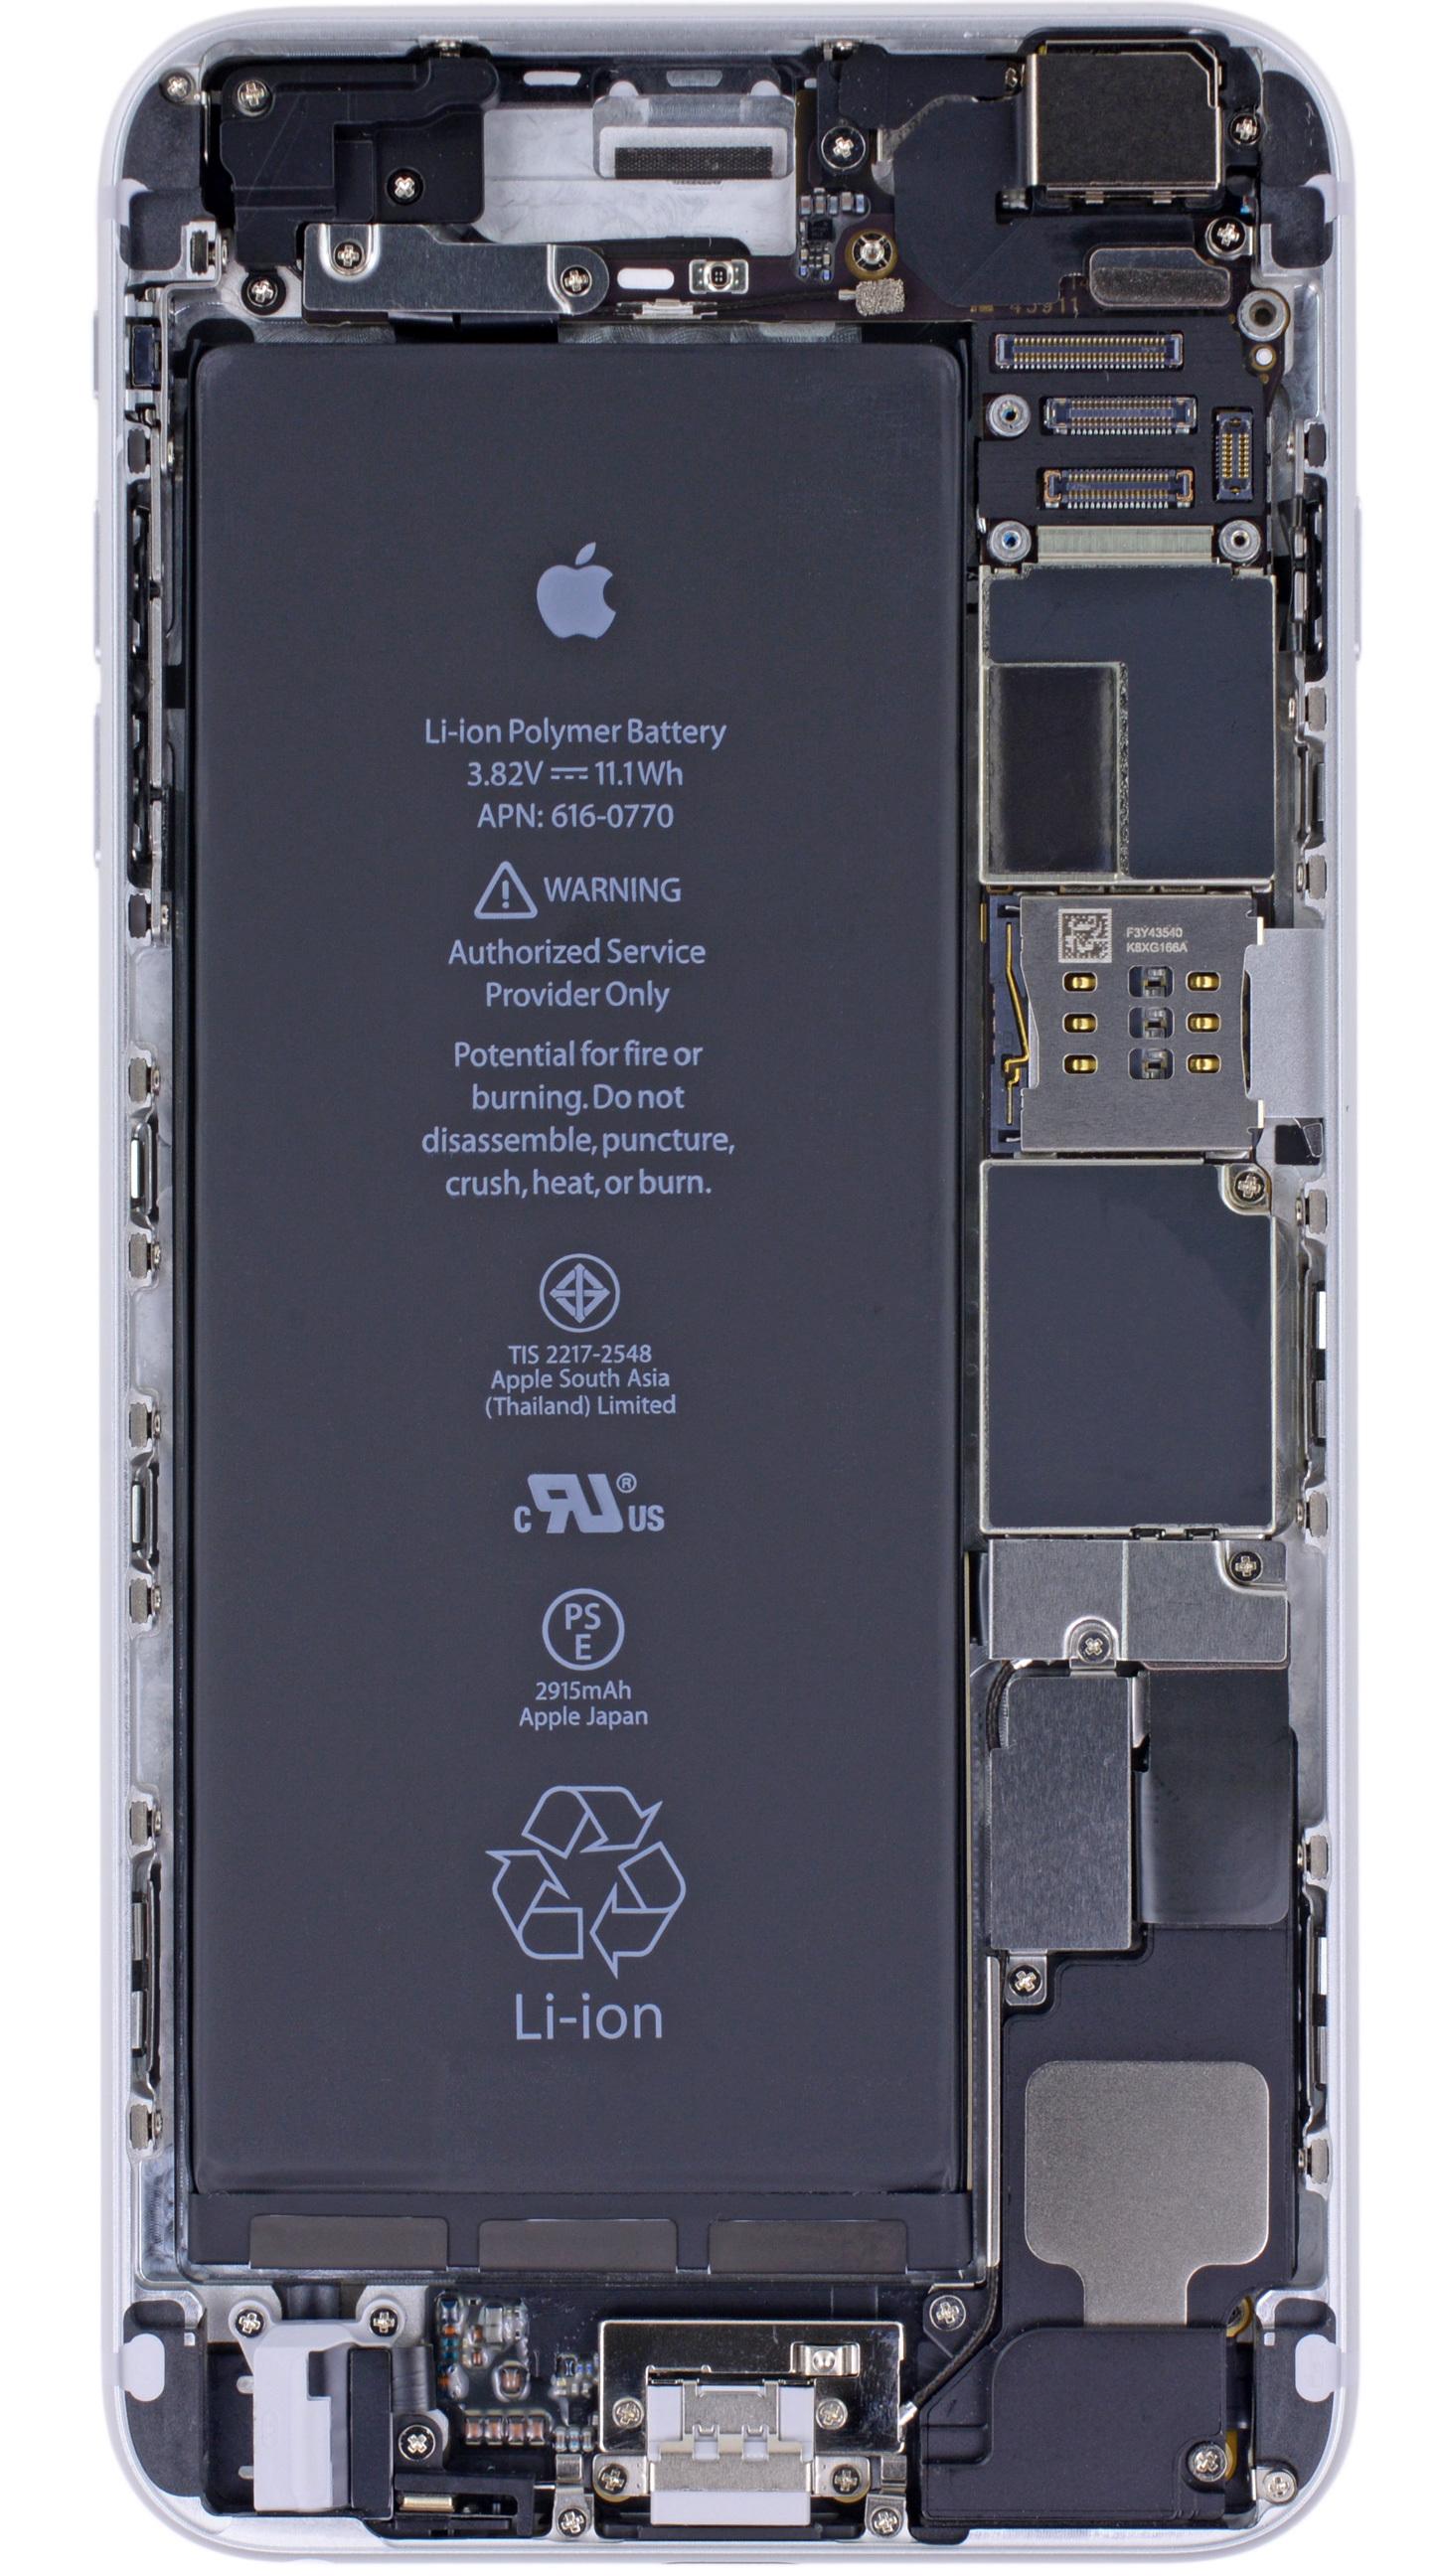 Ifixit Iphone X Teardown Wallpaper X Ray Vision Internals Wallpaper For The Iphone 6 Iphone